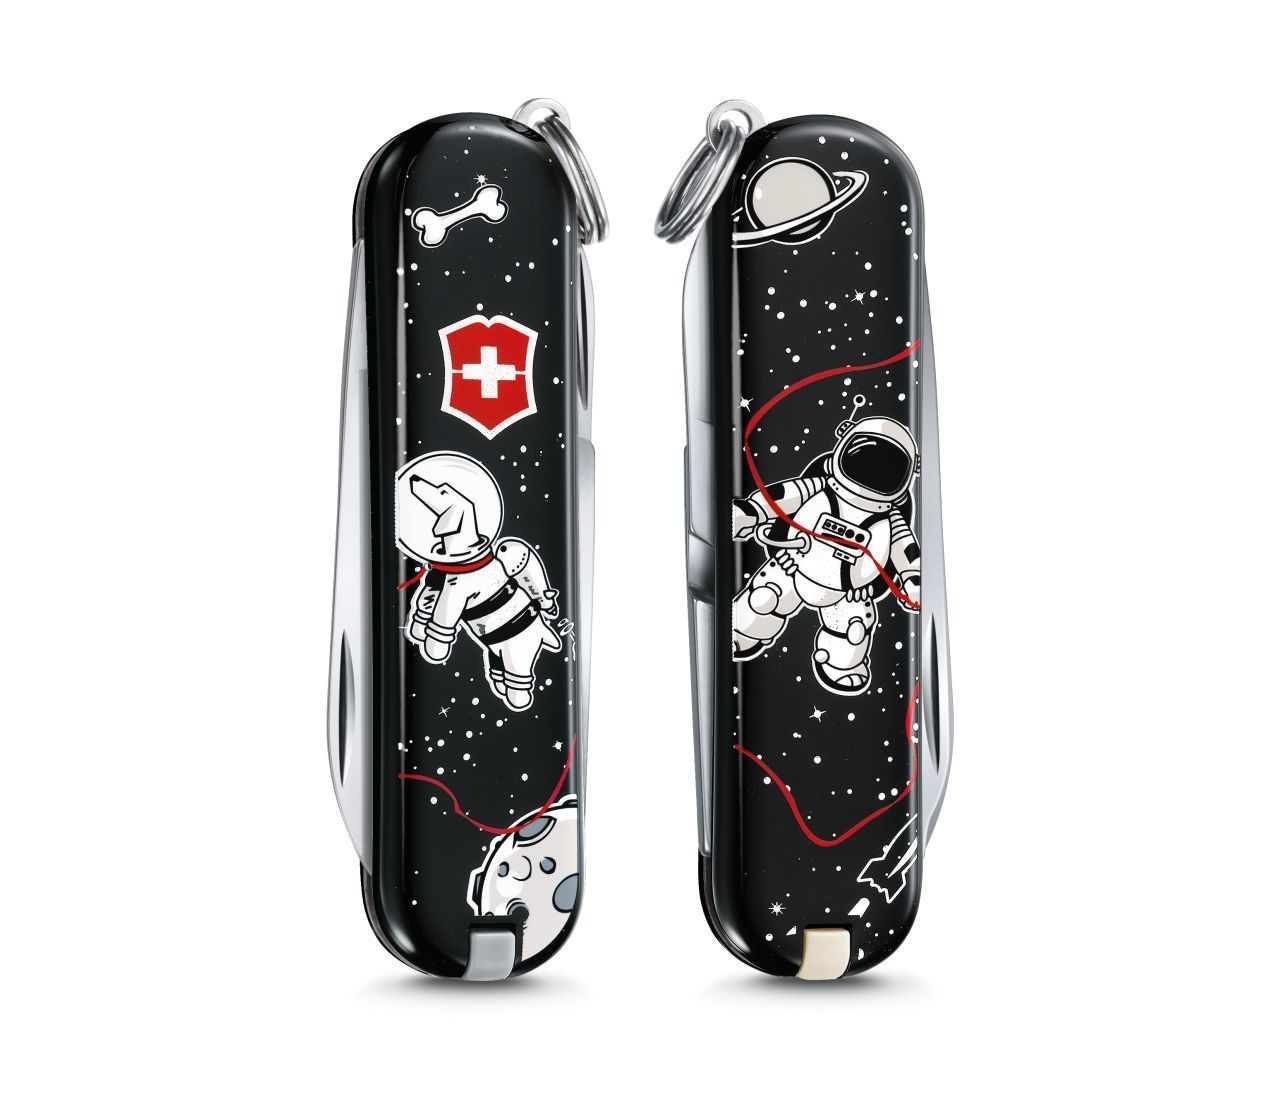 Складной нож Victorinox Classic limited edition 2017 Space Walk (0.6223.L1707) 58мм 7функций пилочка для ногтей leslie store 10 4sides 10pcs lot